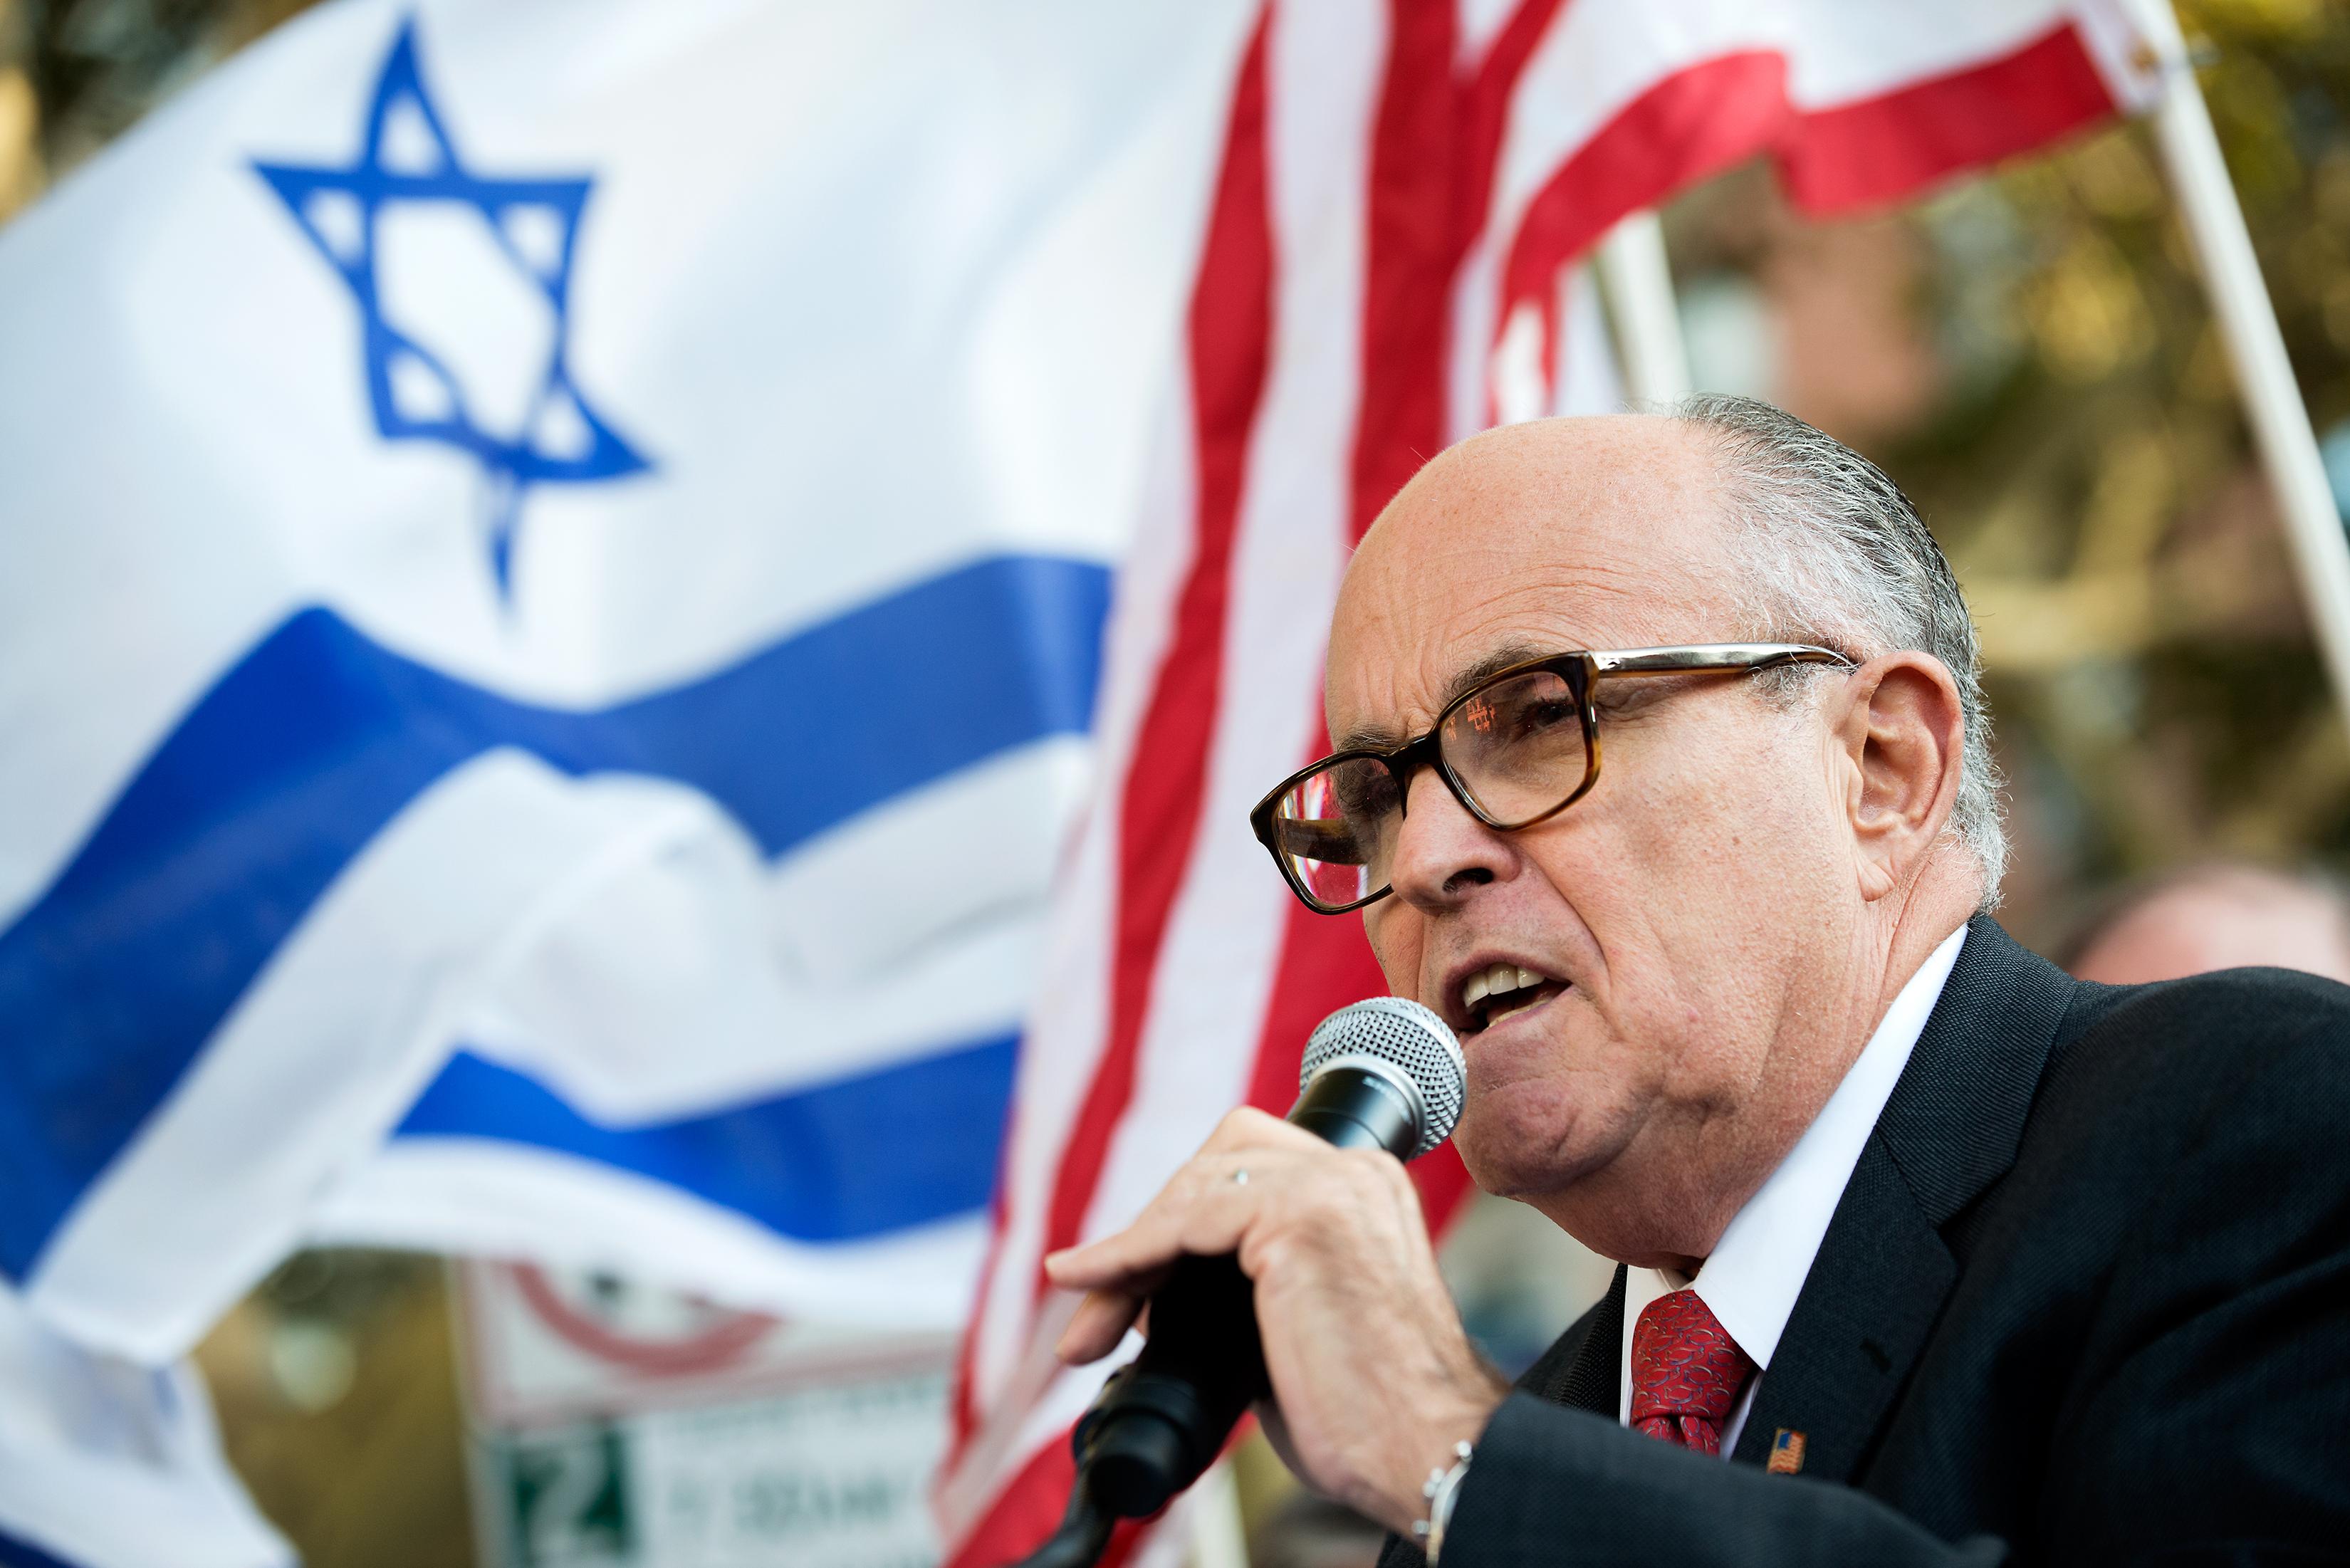 Former Mayor Rudolph Giuliani. (Photo: Bryan Thomas/Getty Images)